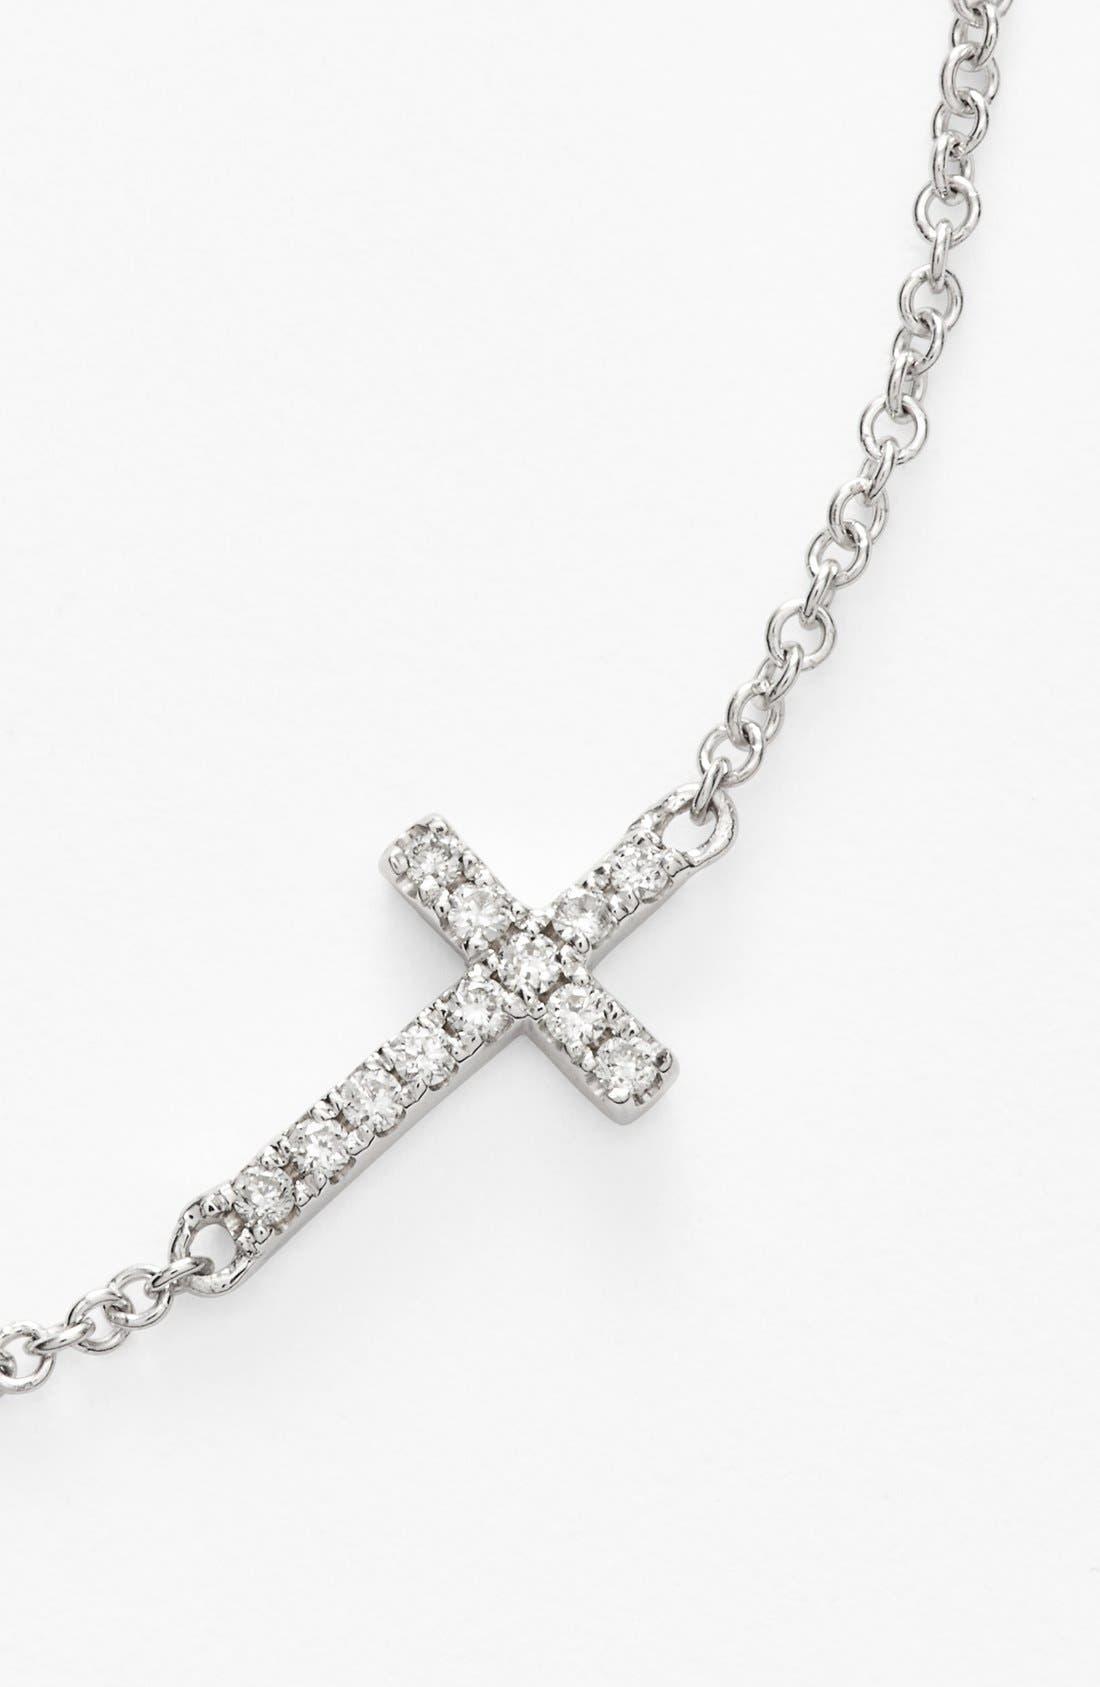 Reversible Diamond Cross Pendant Necklace,                             Alternate thumbnail 6, color,                             WHITE GOLD